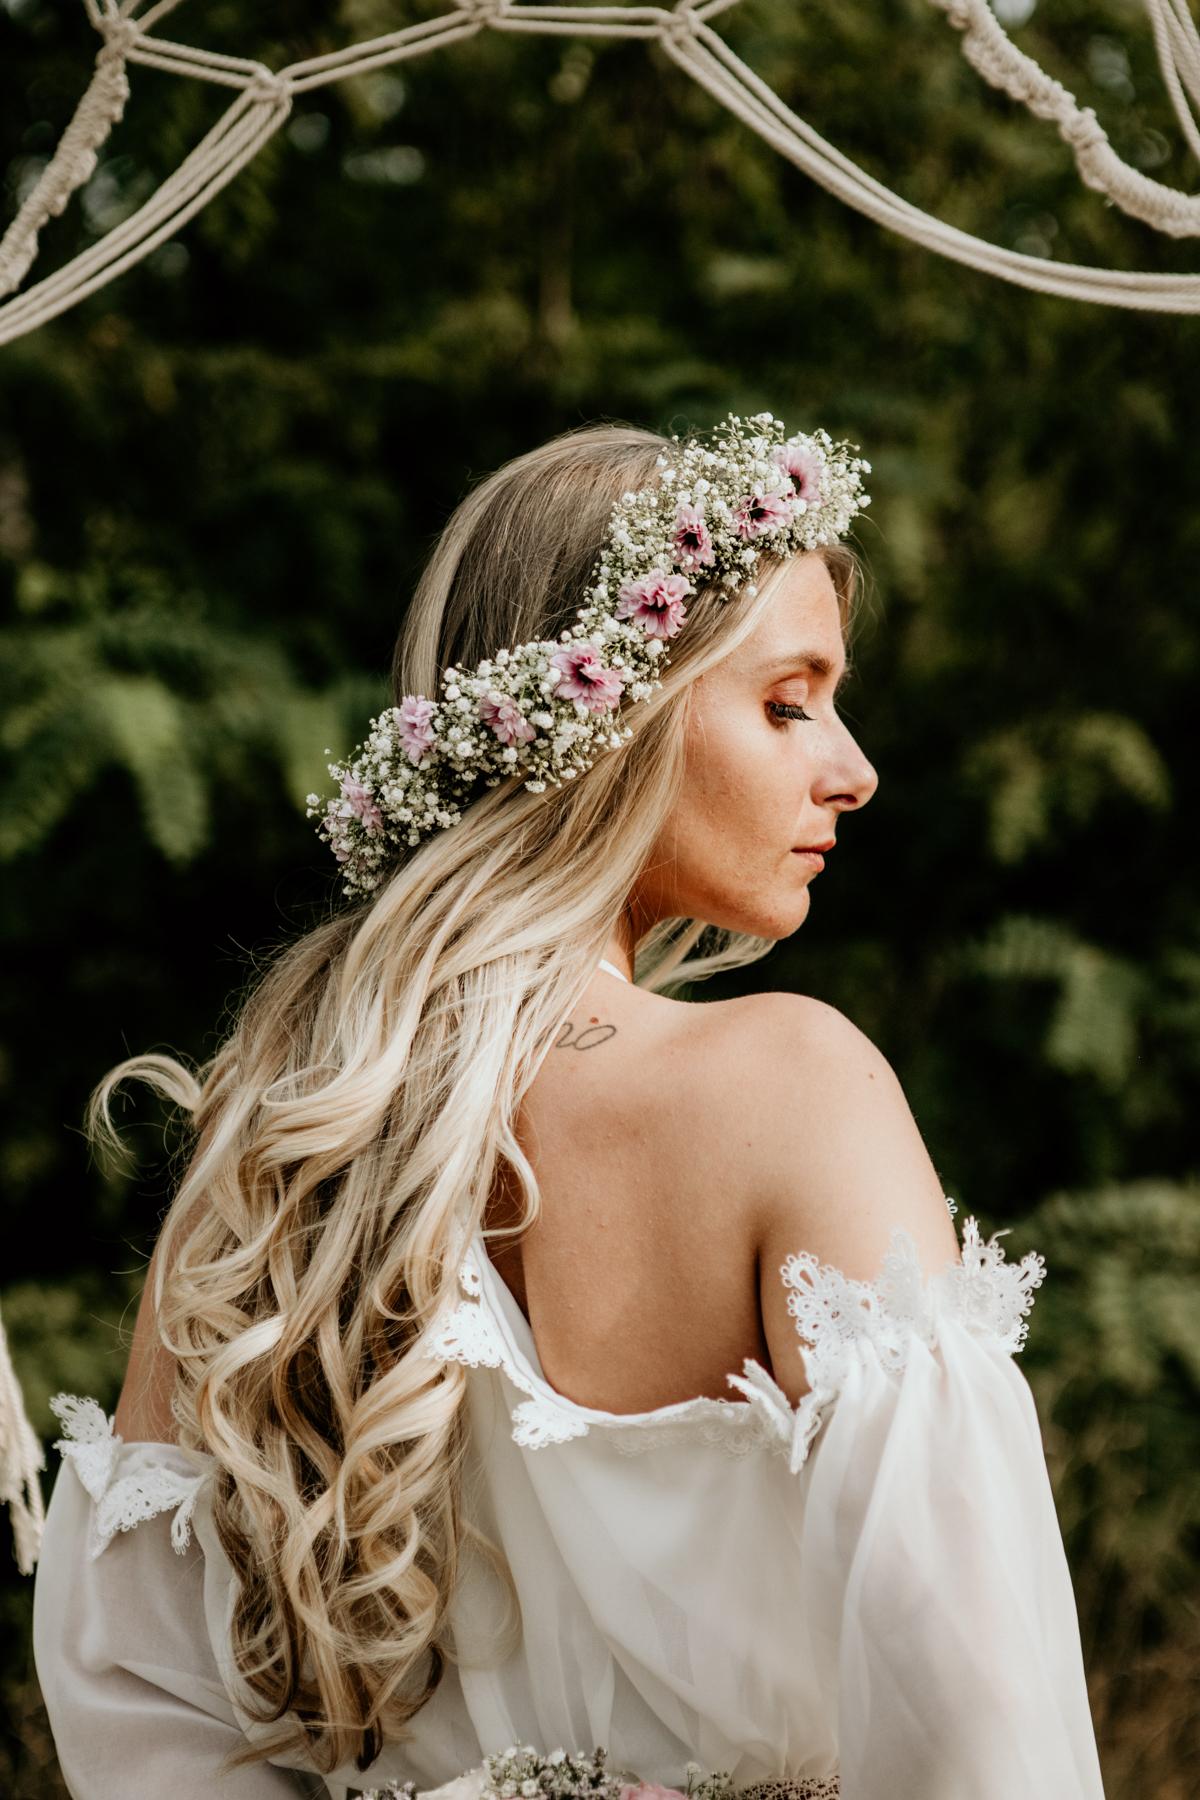 Styled Wedding 1 beeld.schoon-selinderella klein formaat-83